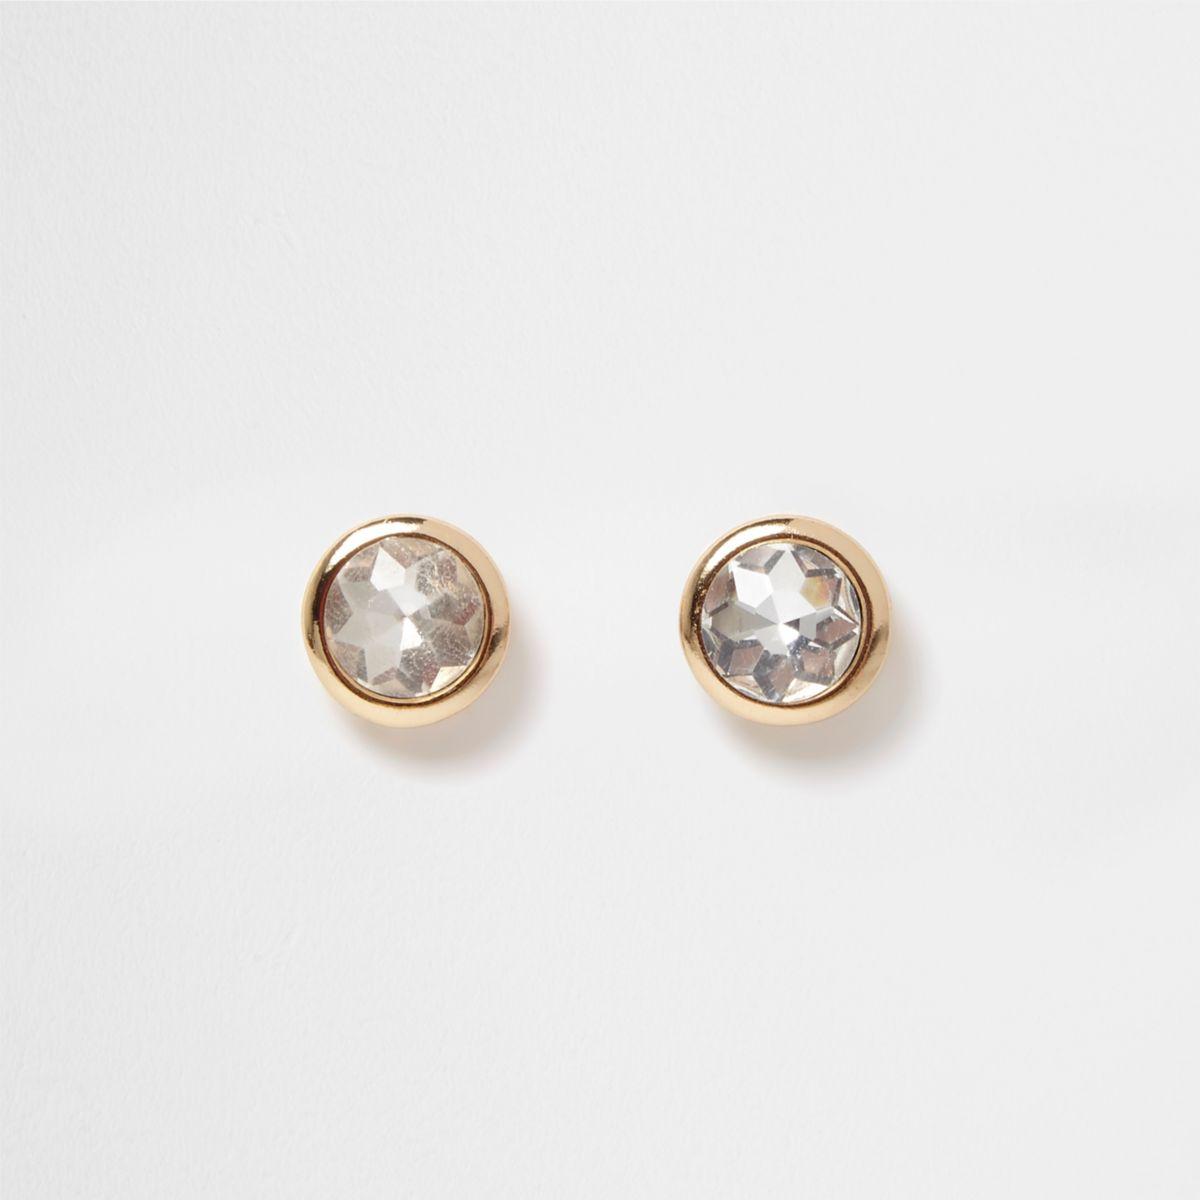 Gold tone crystal gem stud earrings